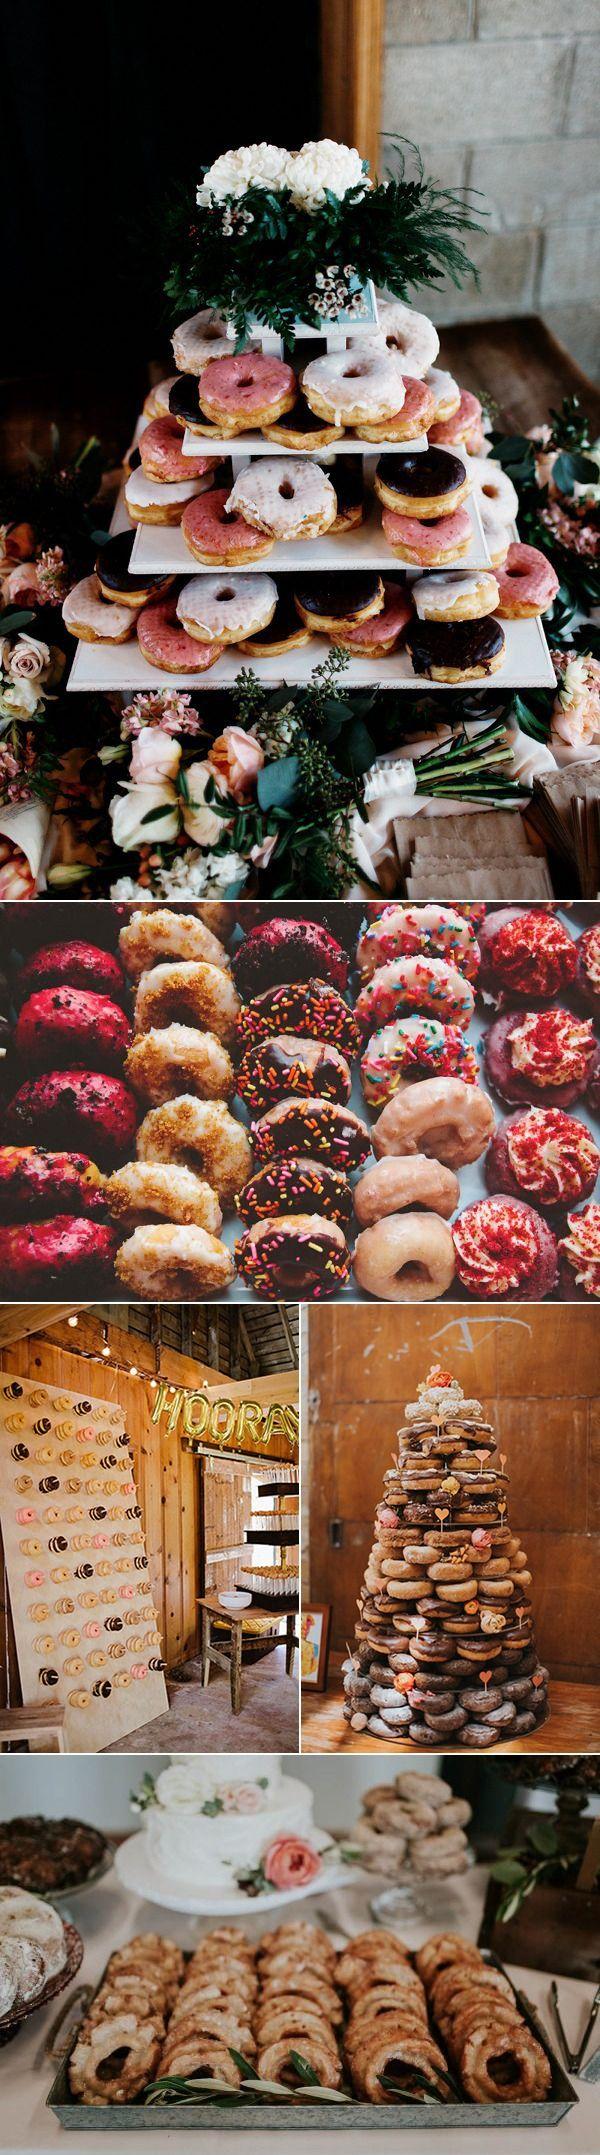 best 25 doughnut wedding cake ideas on pinterest donut wedding cake wedding donuts and donut. Black Bedroom Furniture Sets. Home Design Ideas